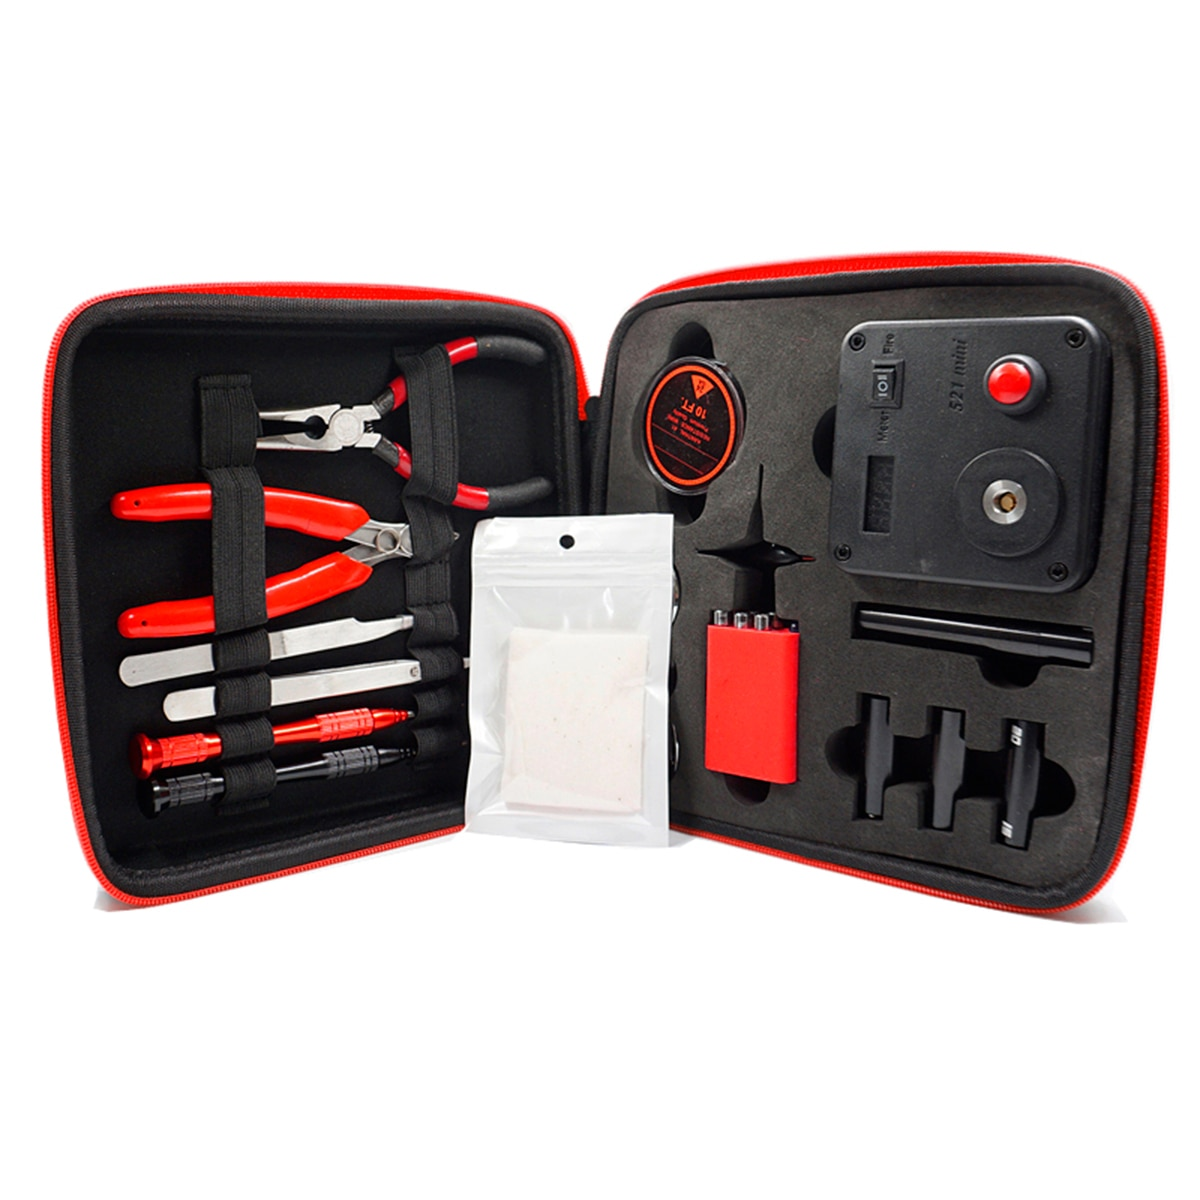 Update Coil Master V3 DIY Kit All-in-One CoilMaster V3+ Electronic Cigarette RDAtomizer coil tool bag Accessories Vape vaper